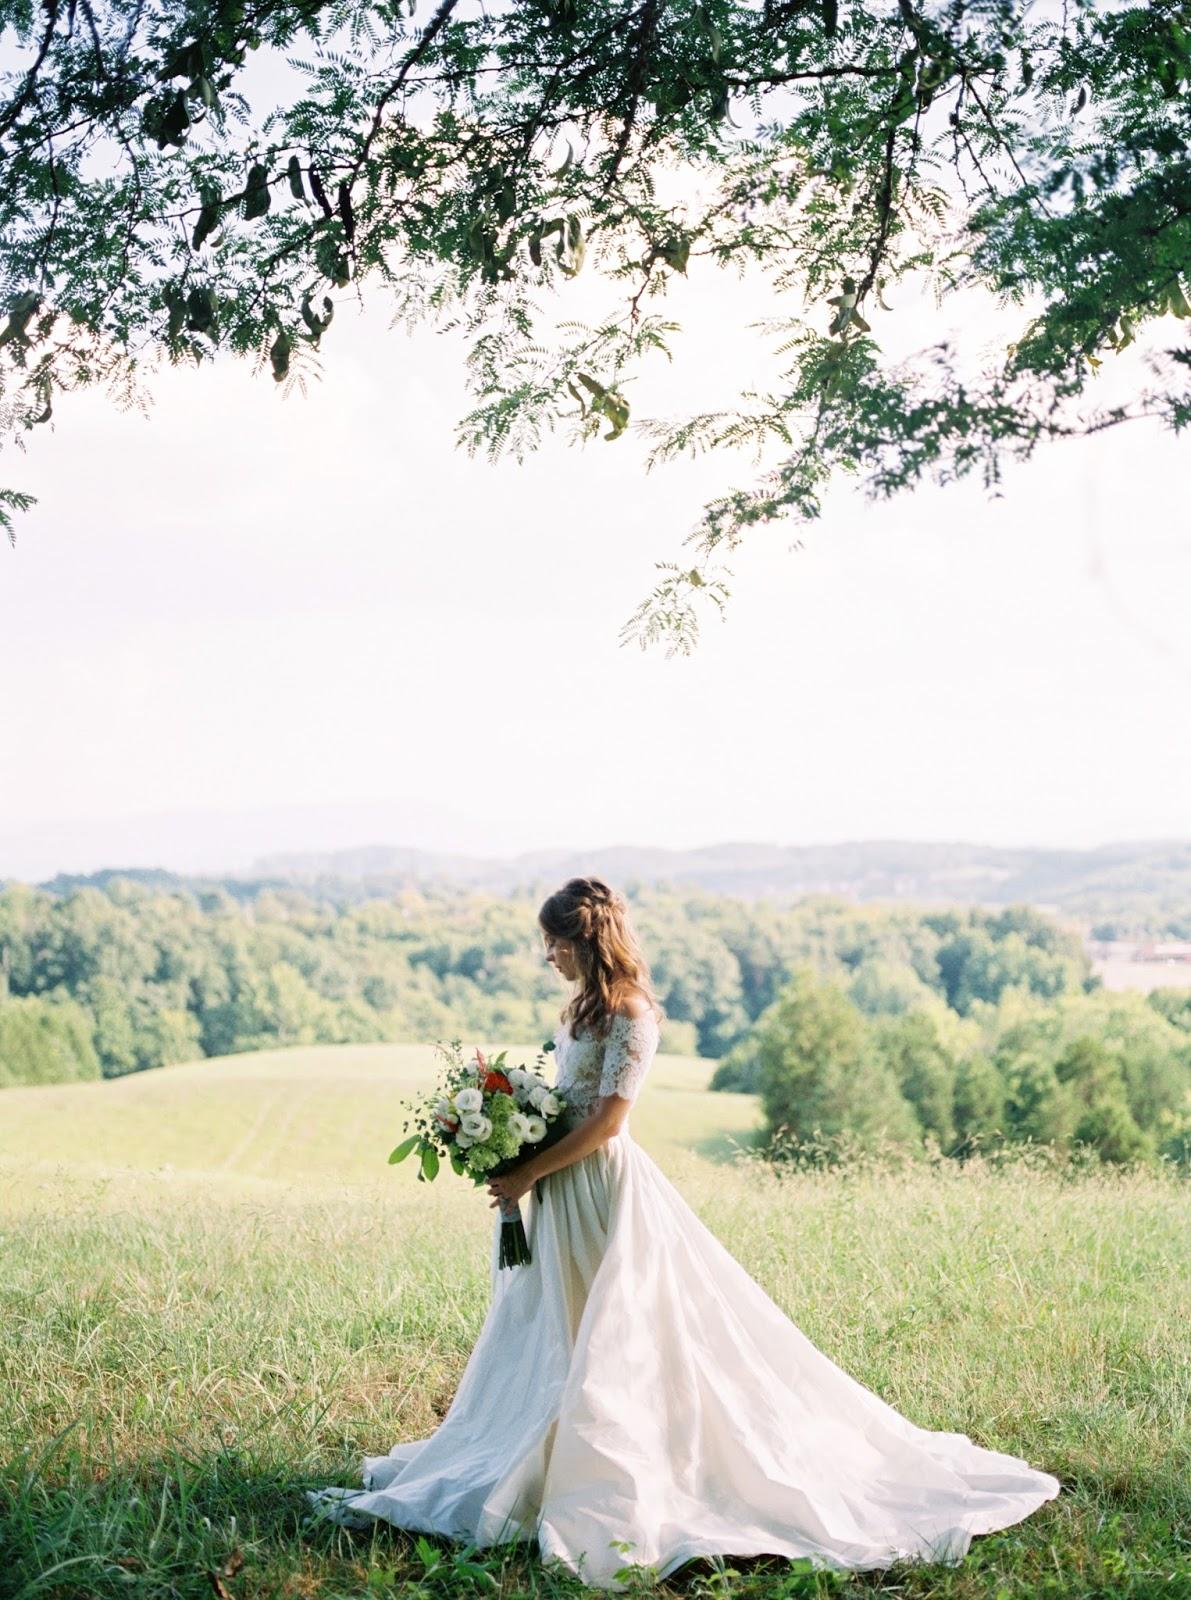 Sevier_Blumen_Editorial_Abigail_Malone_Photography-203.jpg